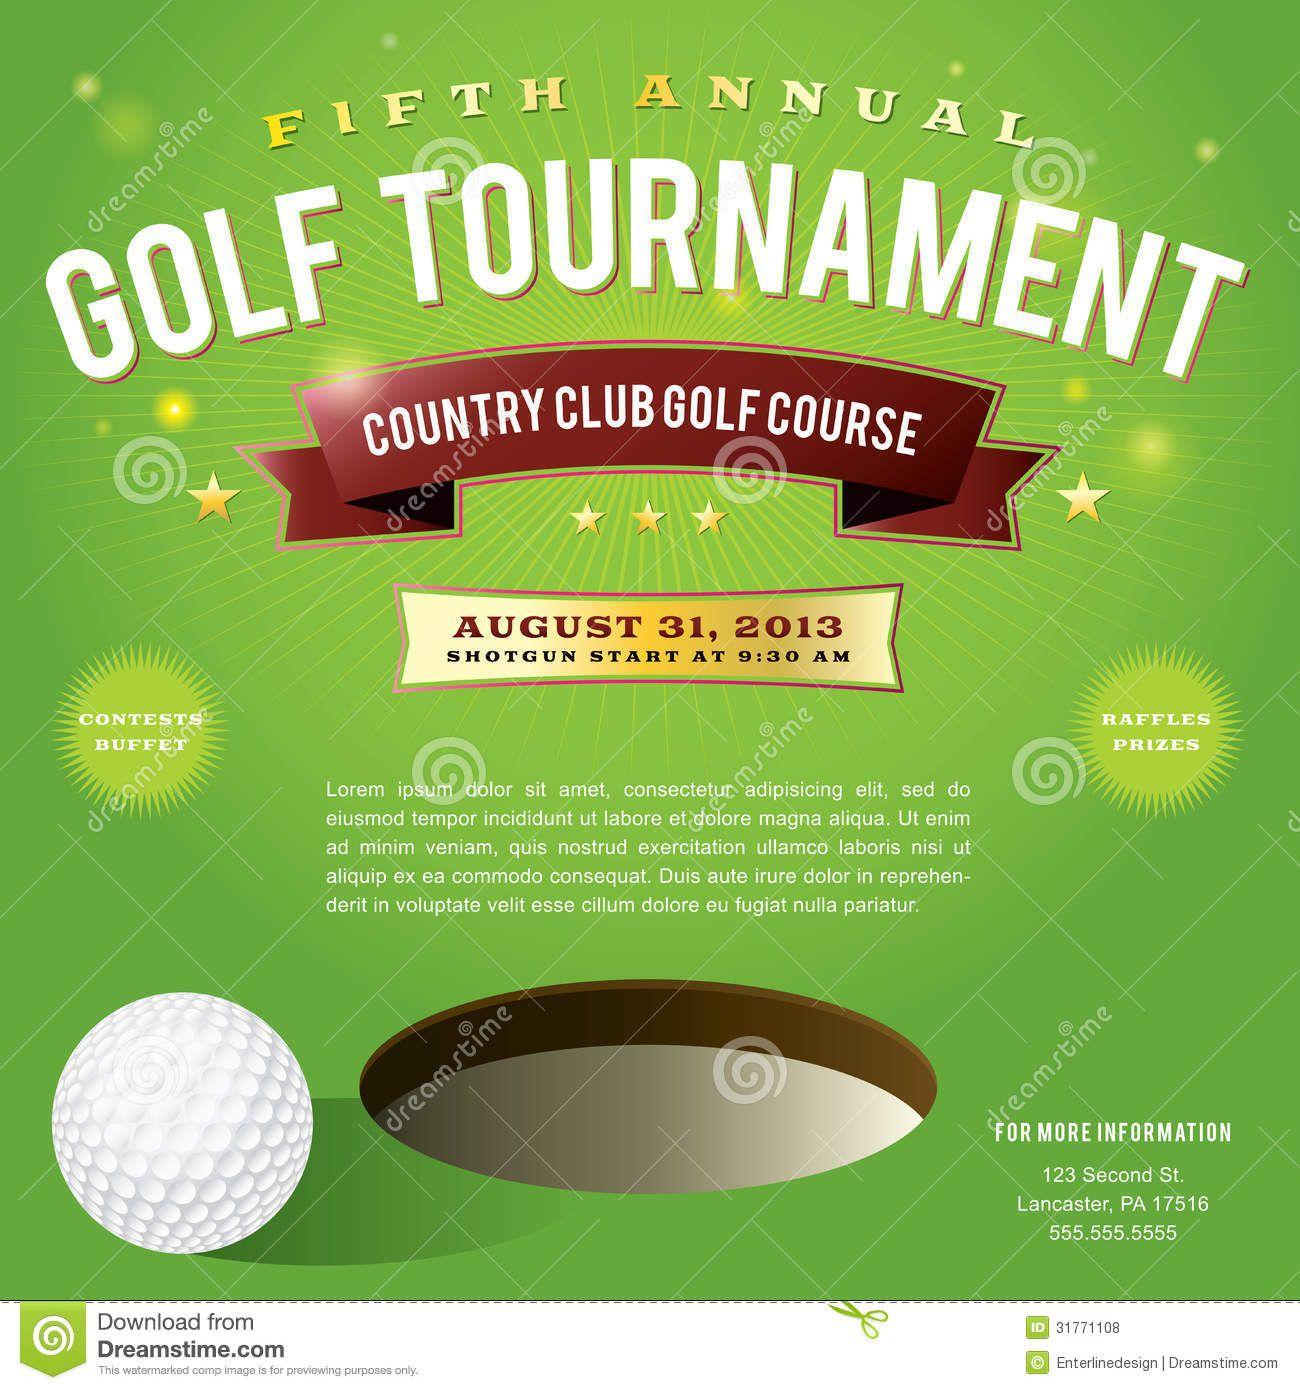 009 Singular Free Charity Golf Tournament Flyer Template Idea Full